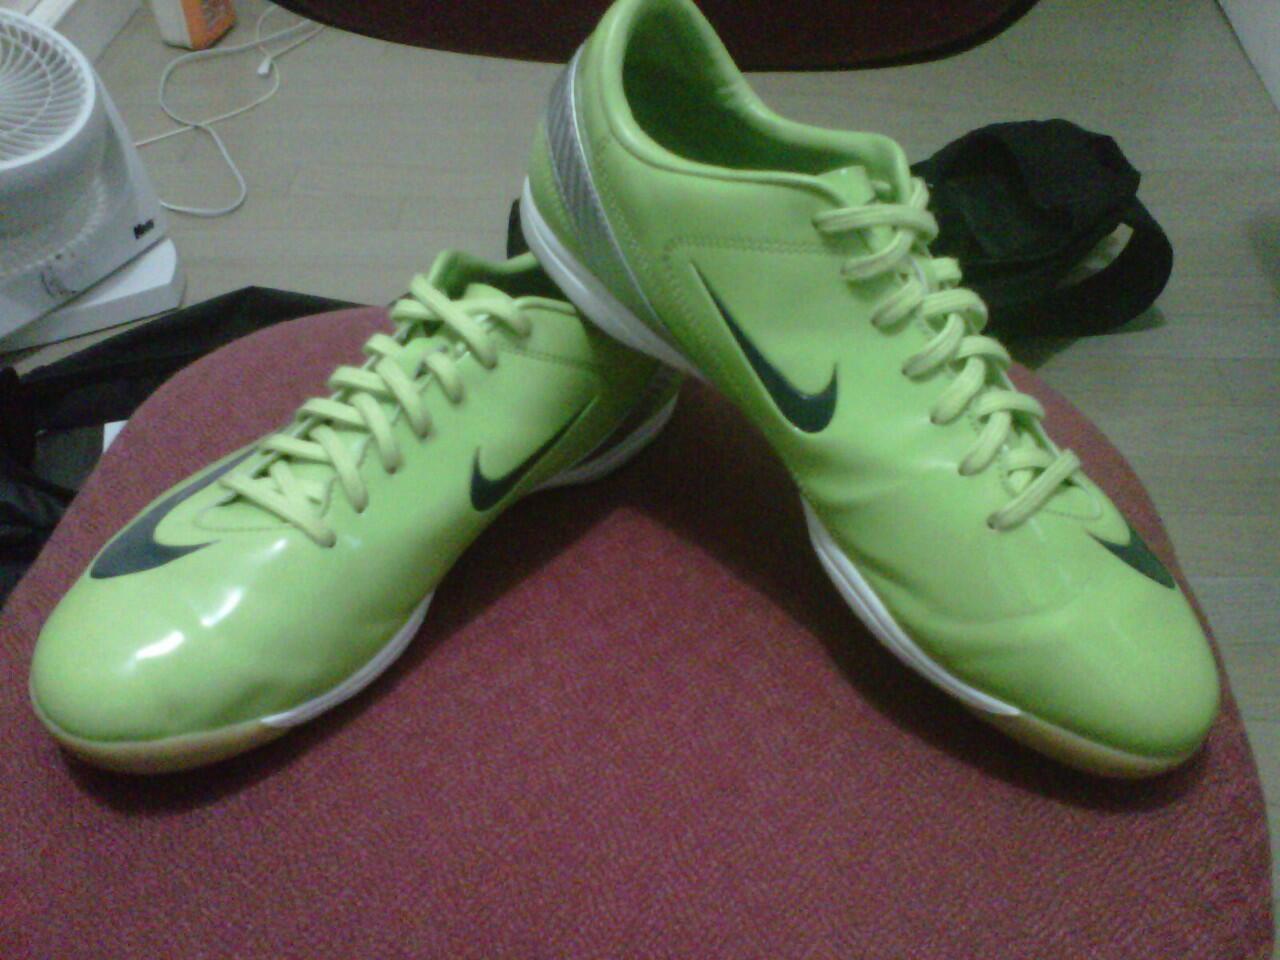 sepatu futsal Nike Mercurial Veloci Citroen IC Rare size 45 ORIGINAL